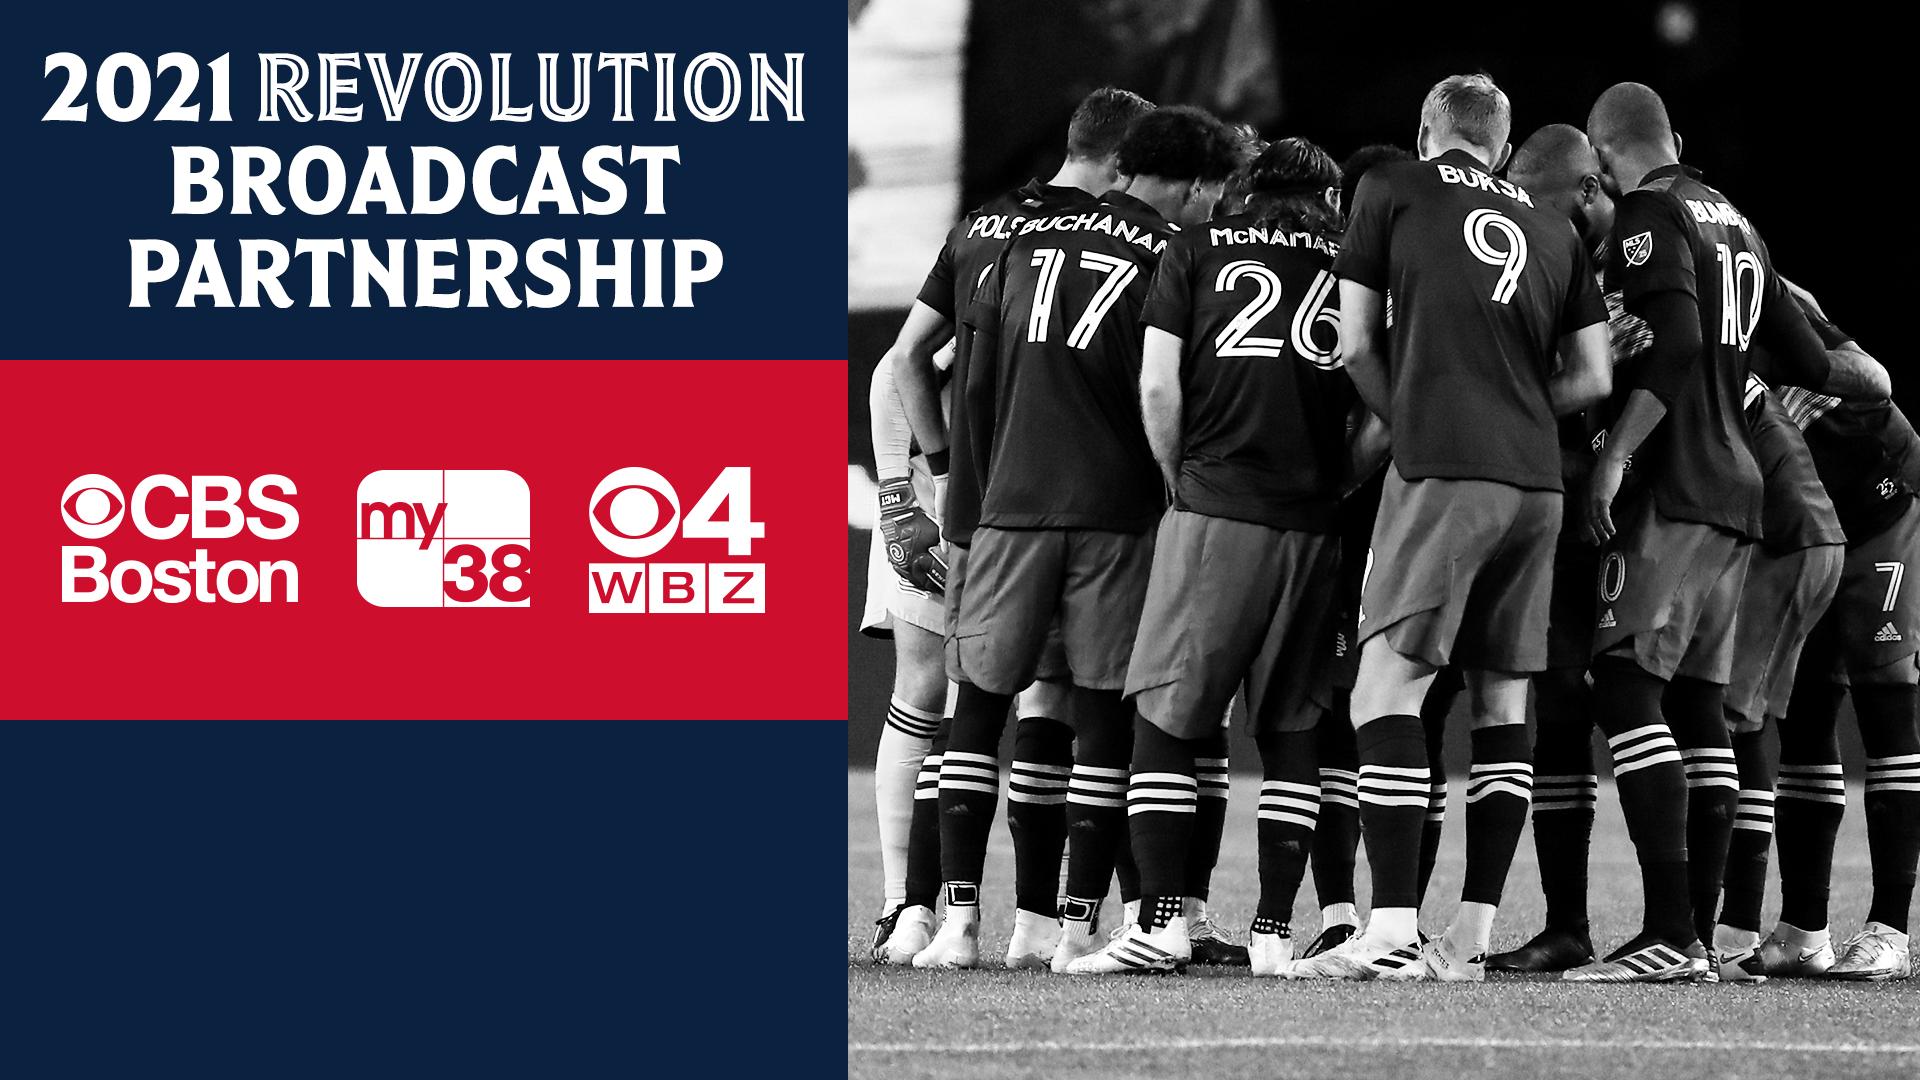 CBS Boston and New England Revolution announce new local broadcast partnership | New England Revolution